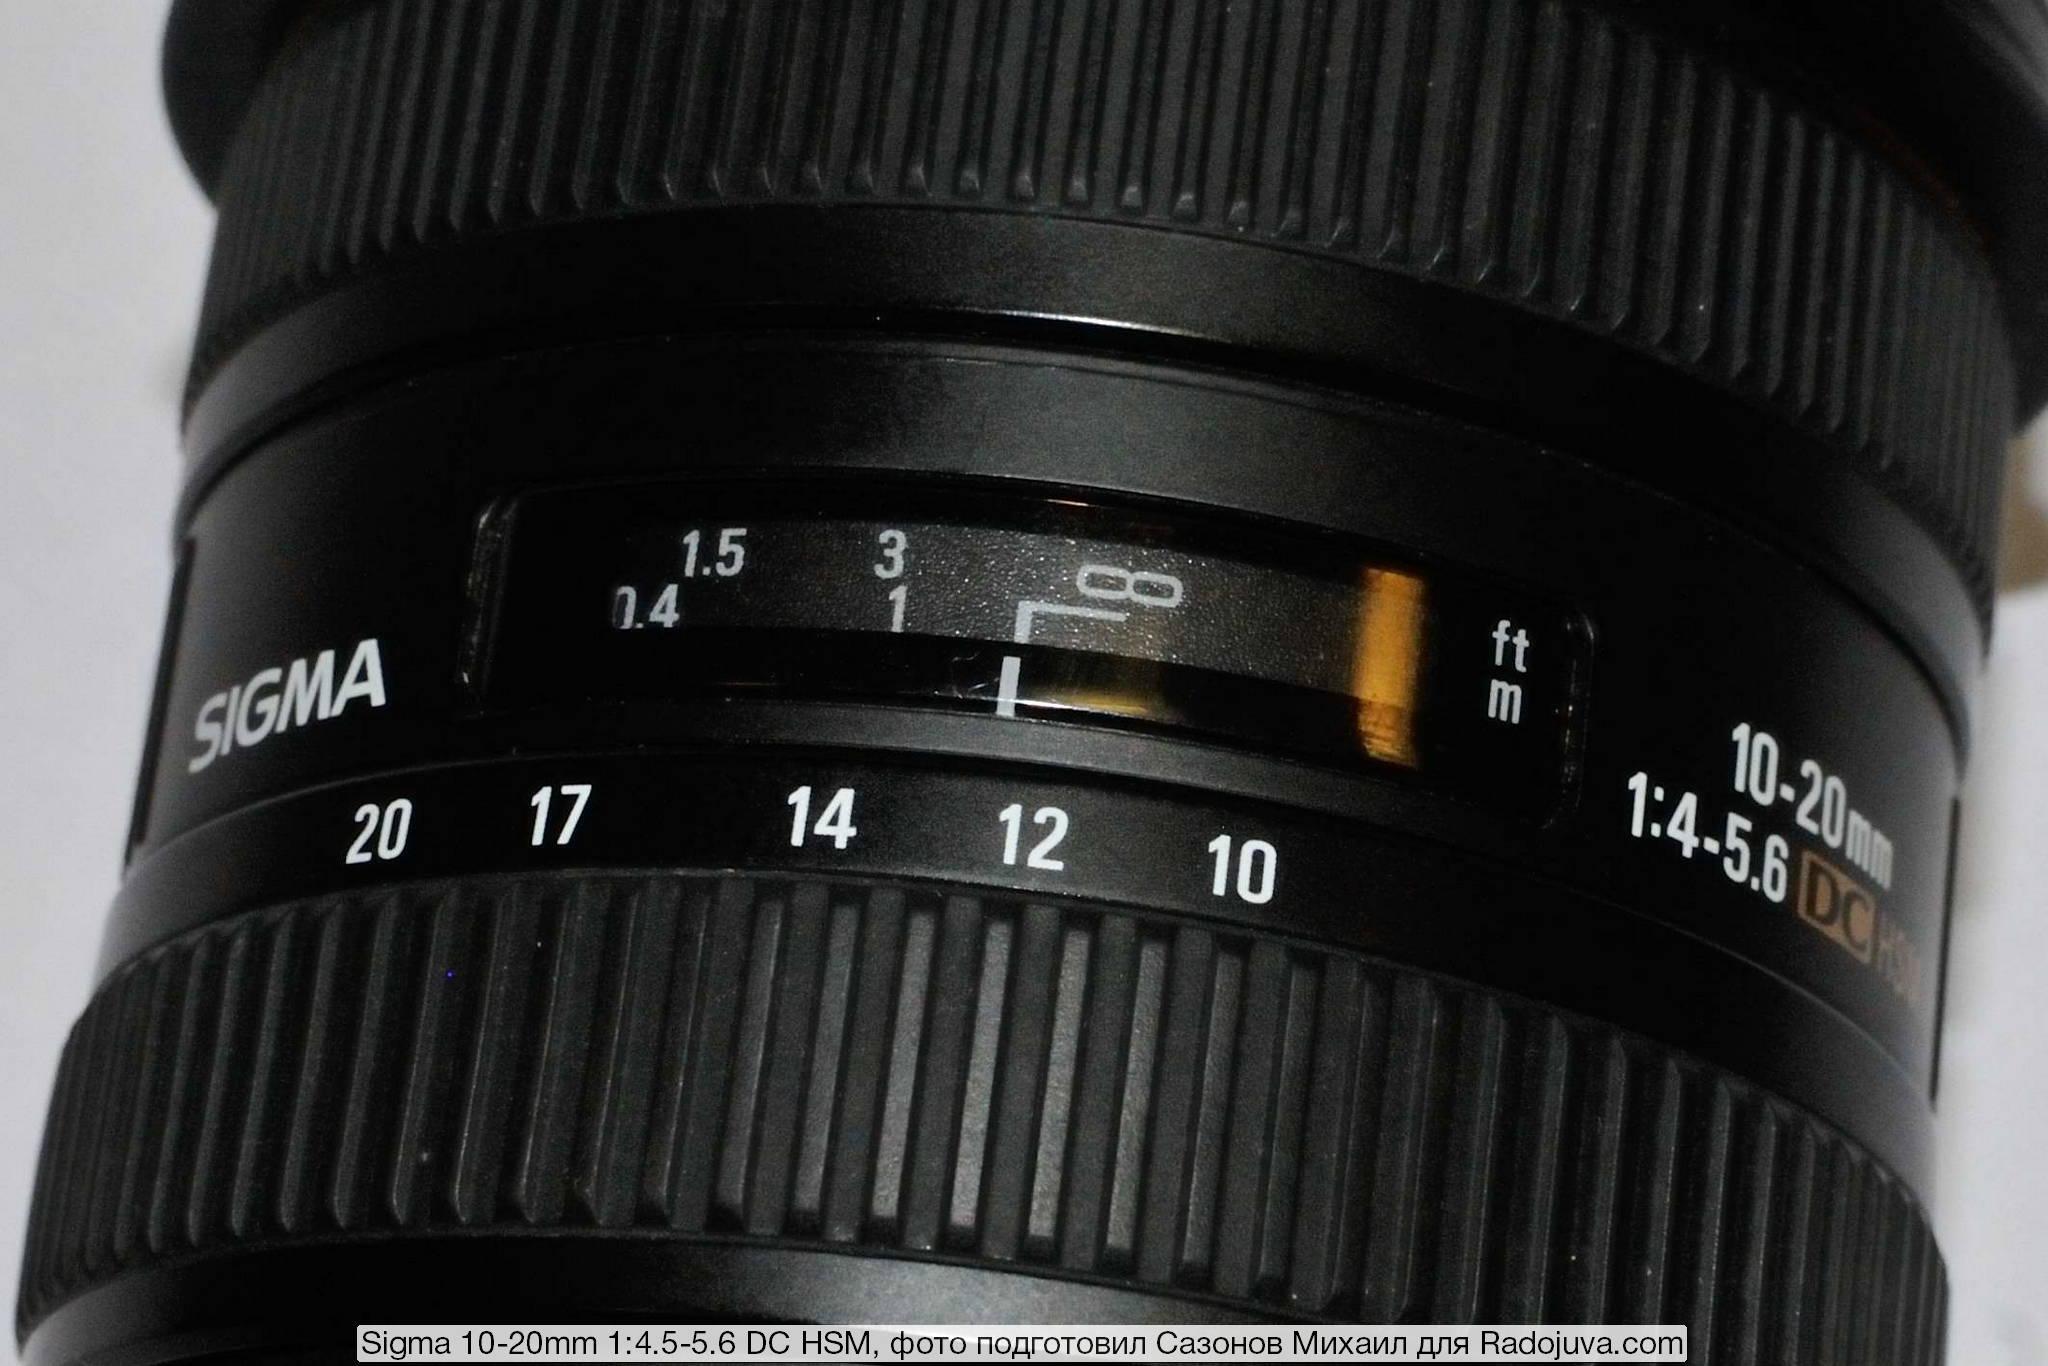 Sigma 10-20mm 1:4.5-5.6 DC HSM